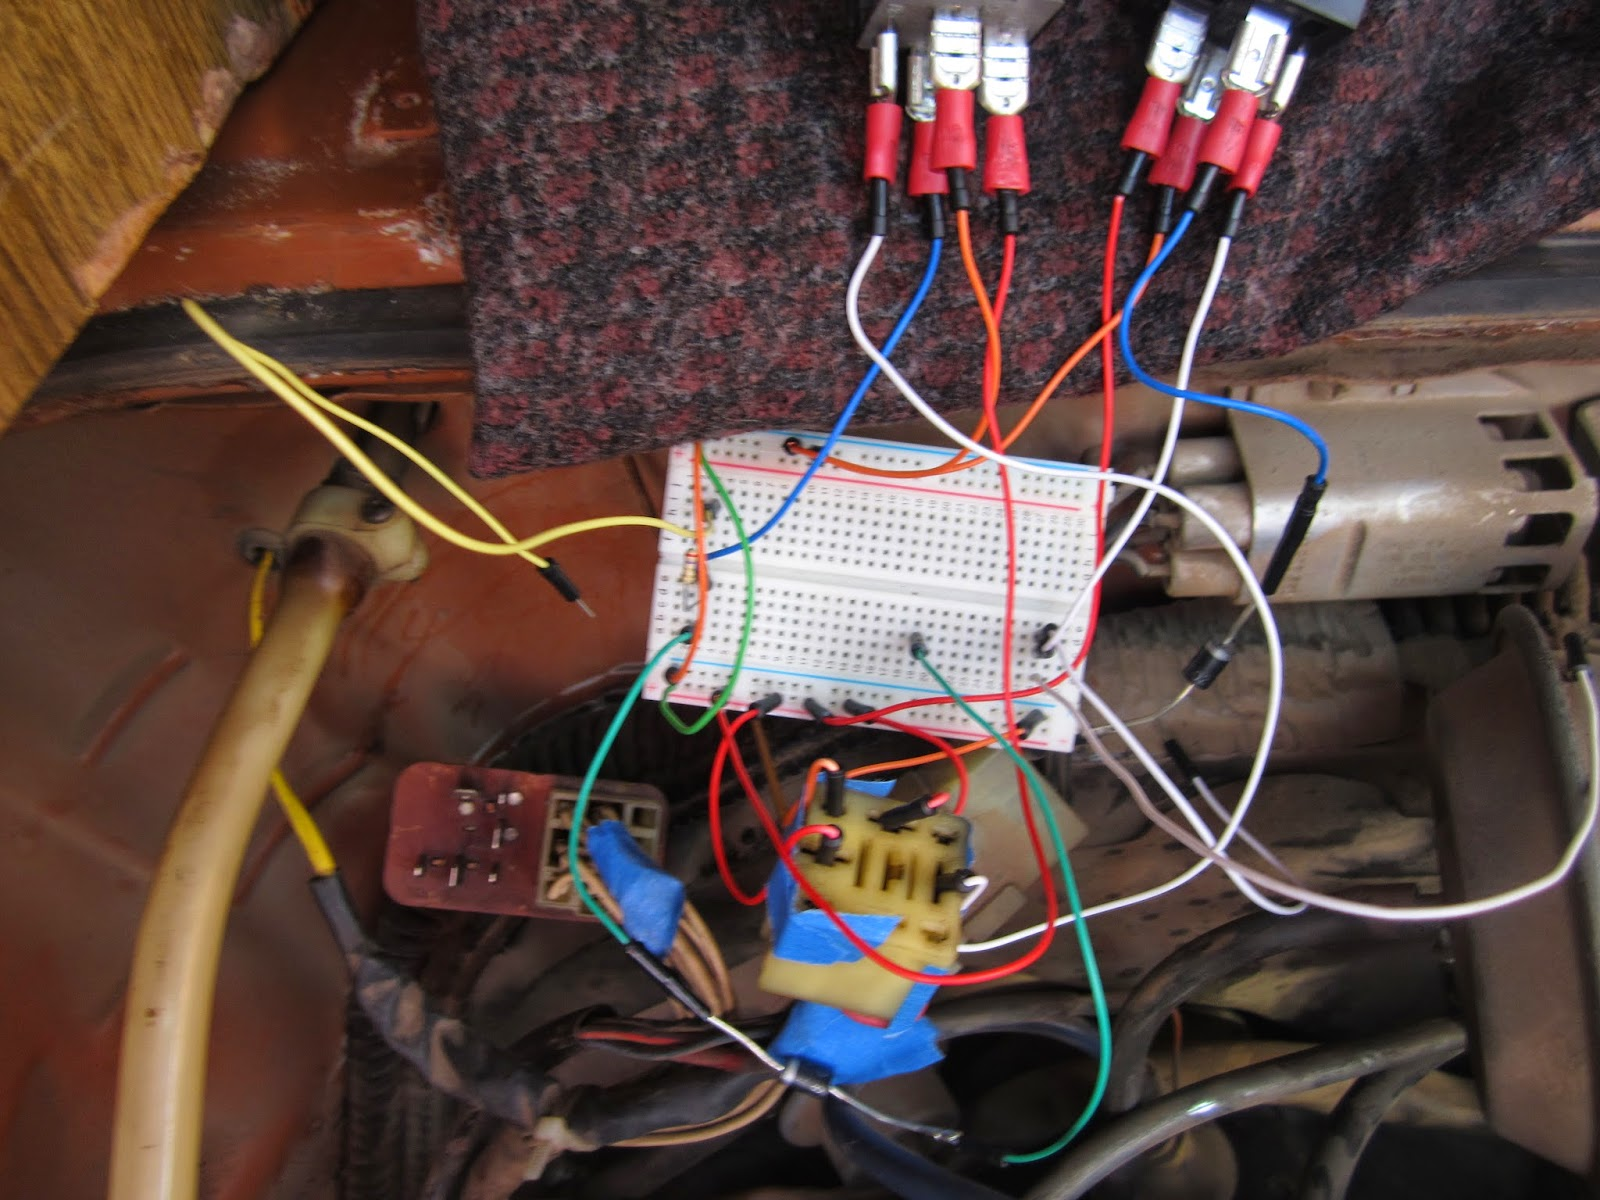 1982 vanagon fuse diagram wiring diagrams schematics 68 vw bug fuse panel 1982 vanagon fuse box [ 1600 x 1200 Pixel ]